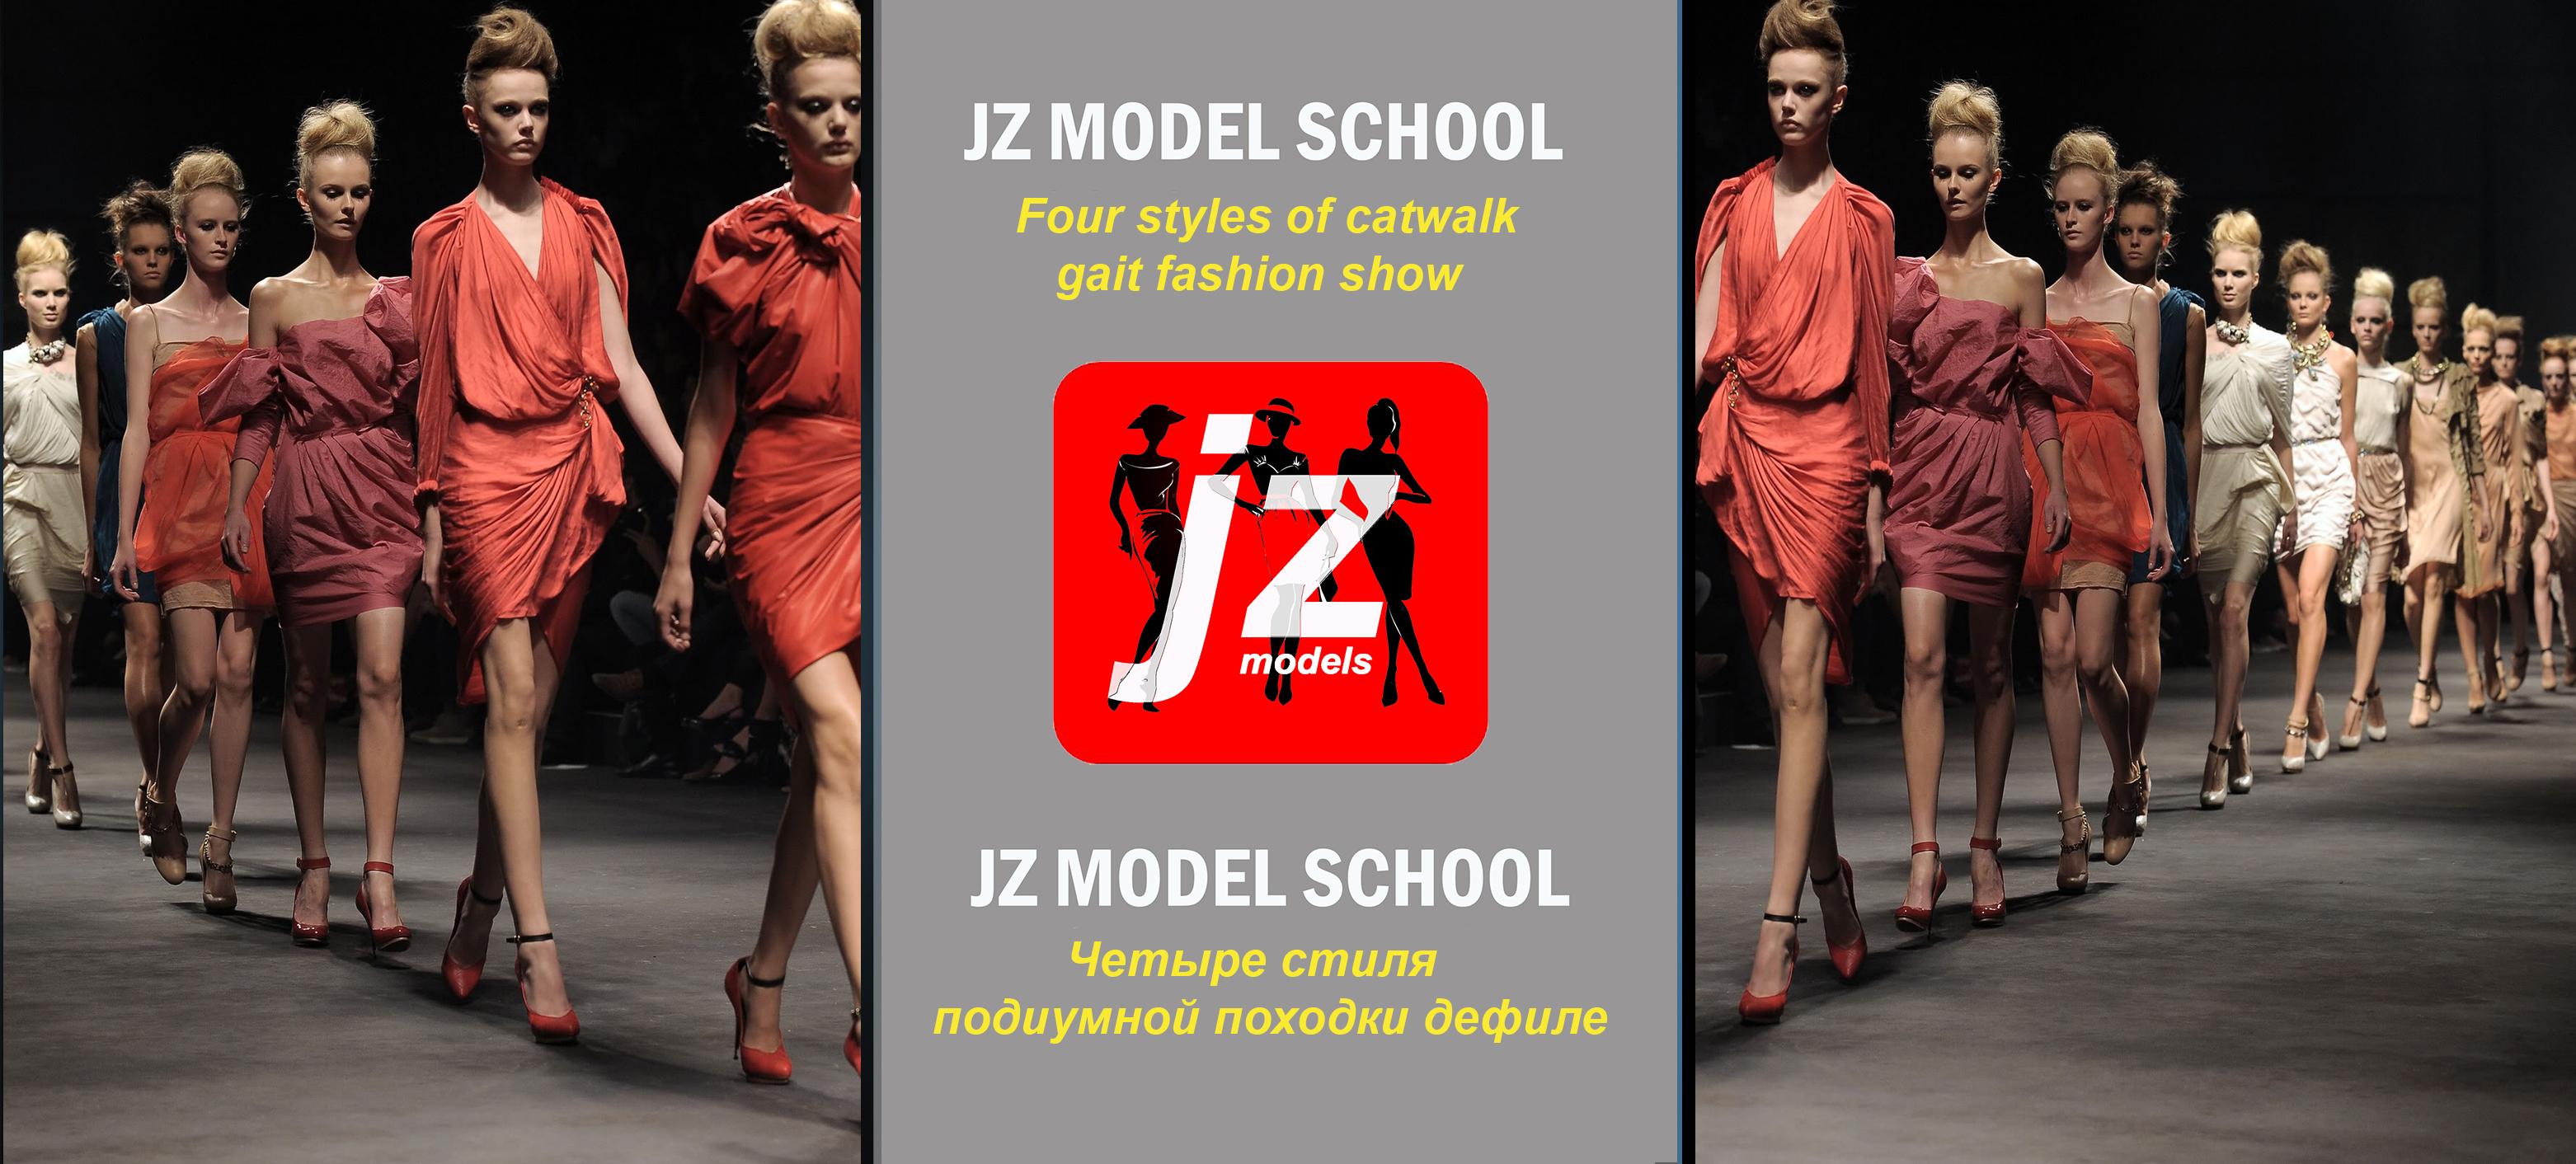 Four styles of catwalk gait fashion show Четыре стиля подиумной походки дефиле